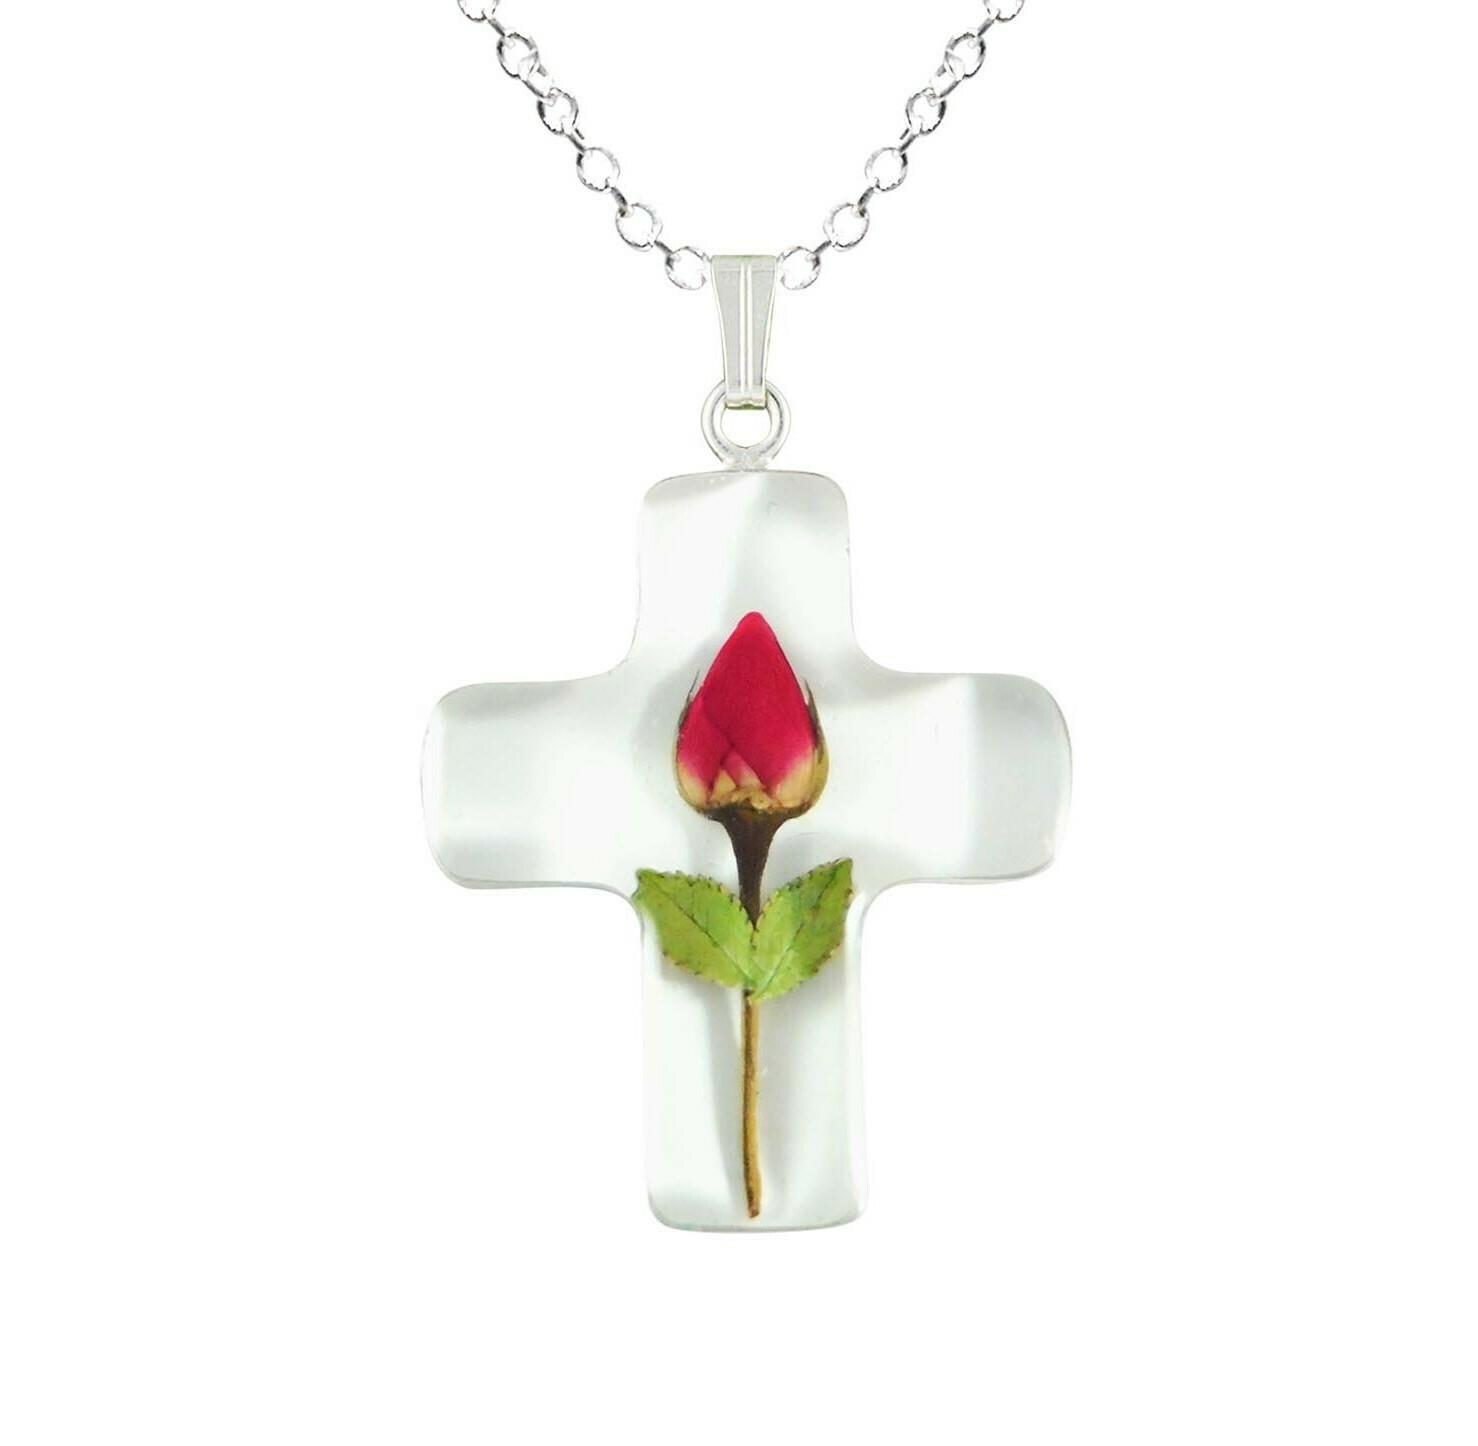 Rose Necklace, Medium Cross, White background